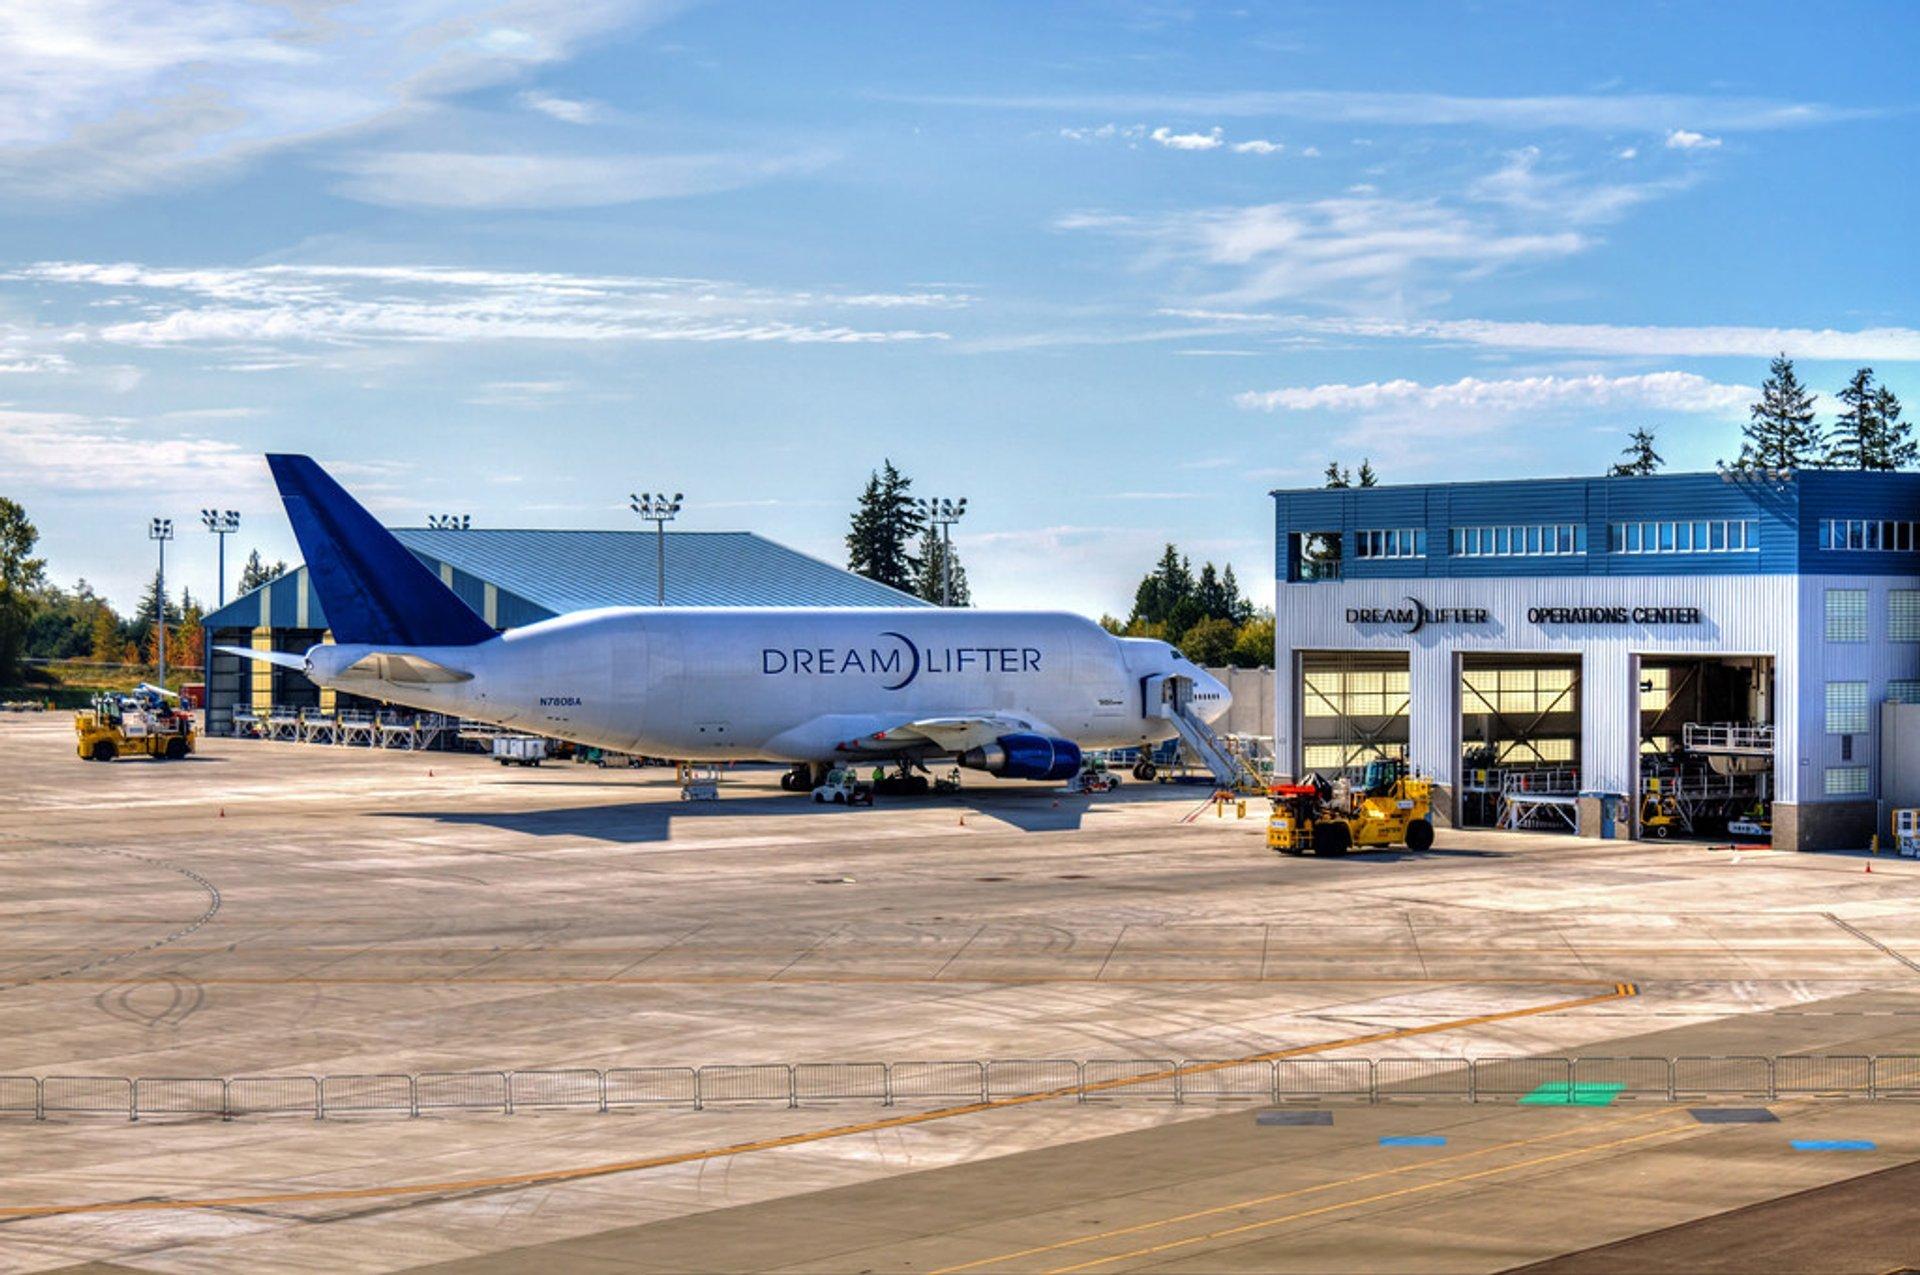 Boeing Factory in Seattle 2020 - Best Time